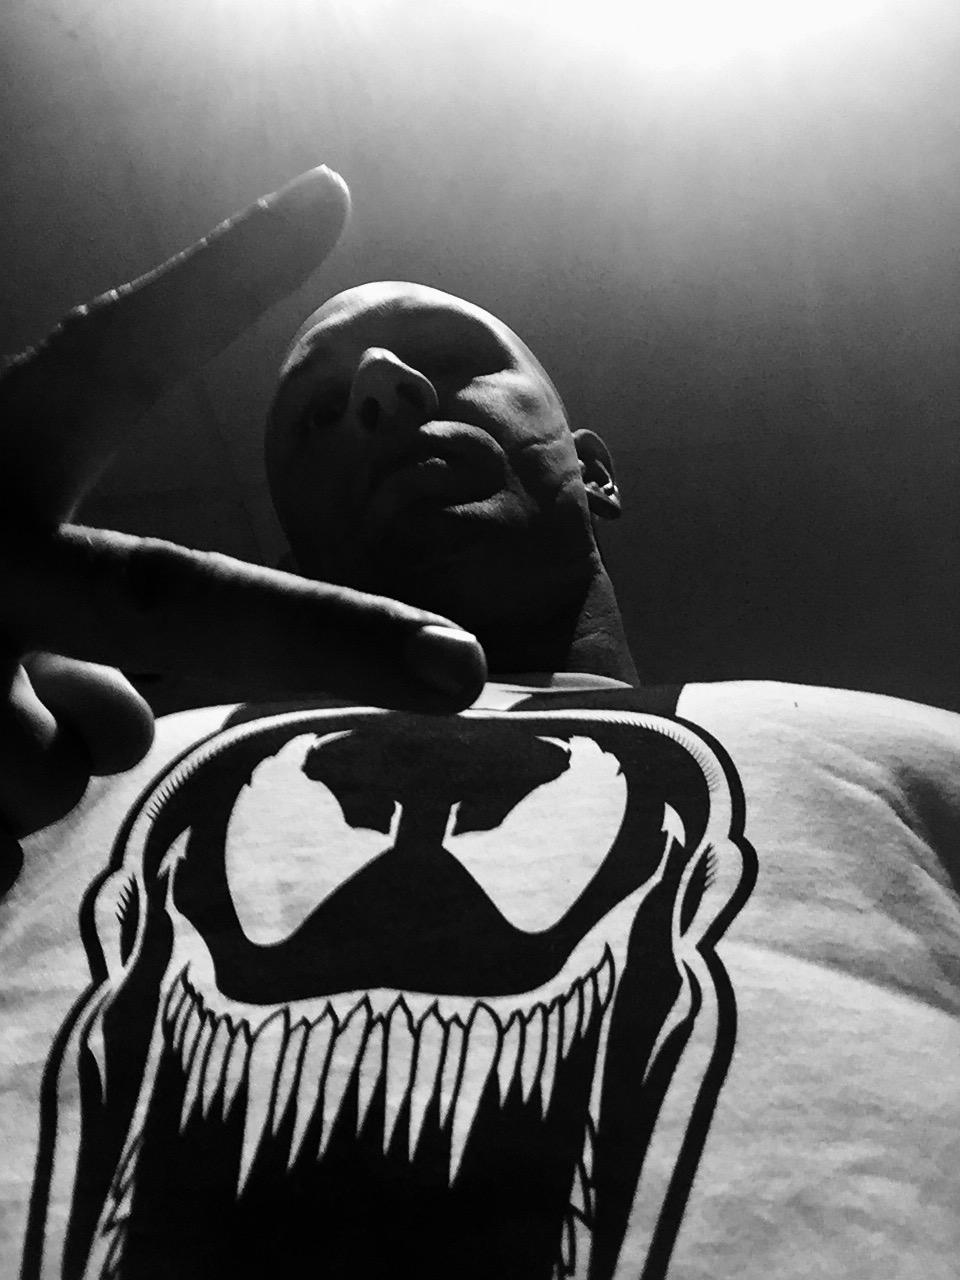 sonys-venom-film-will-star-tom-hardy-and-be-directed-by-ruben-fleischer